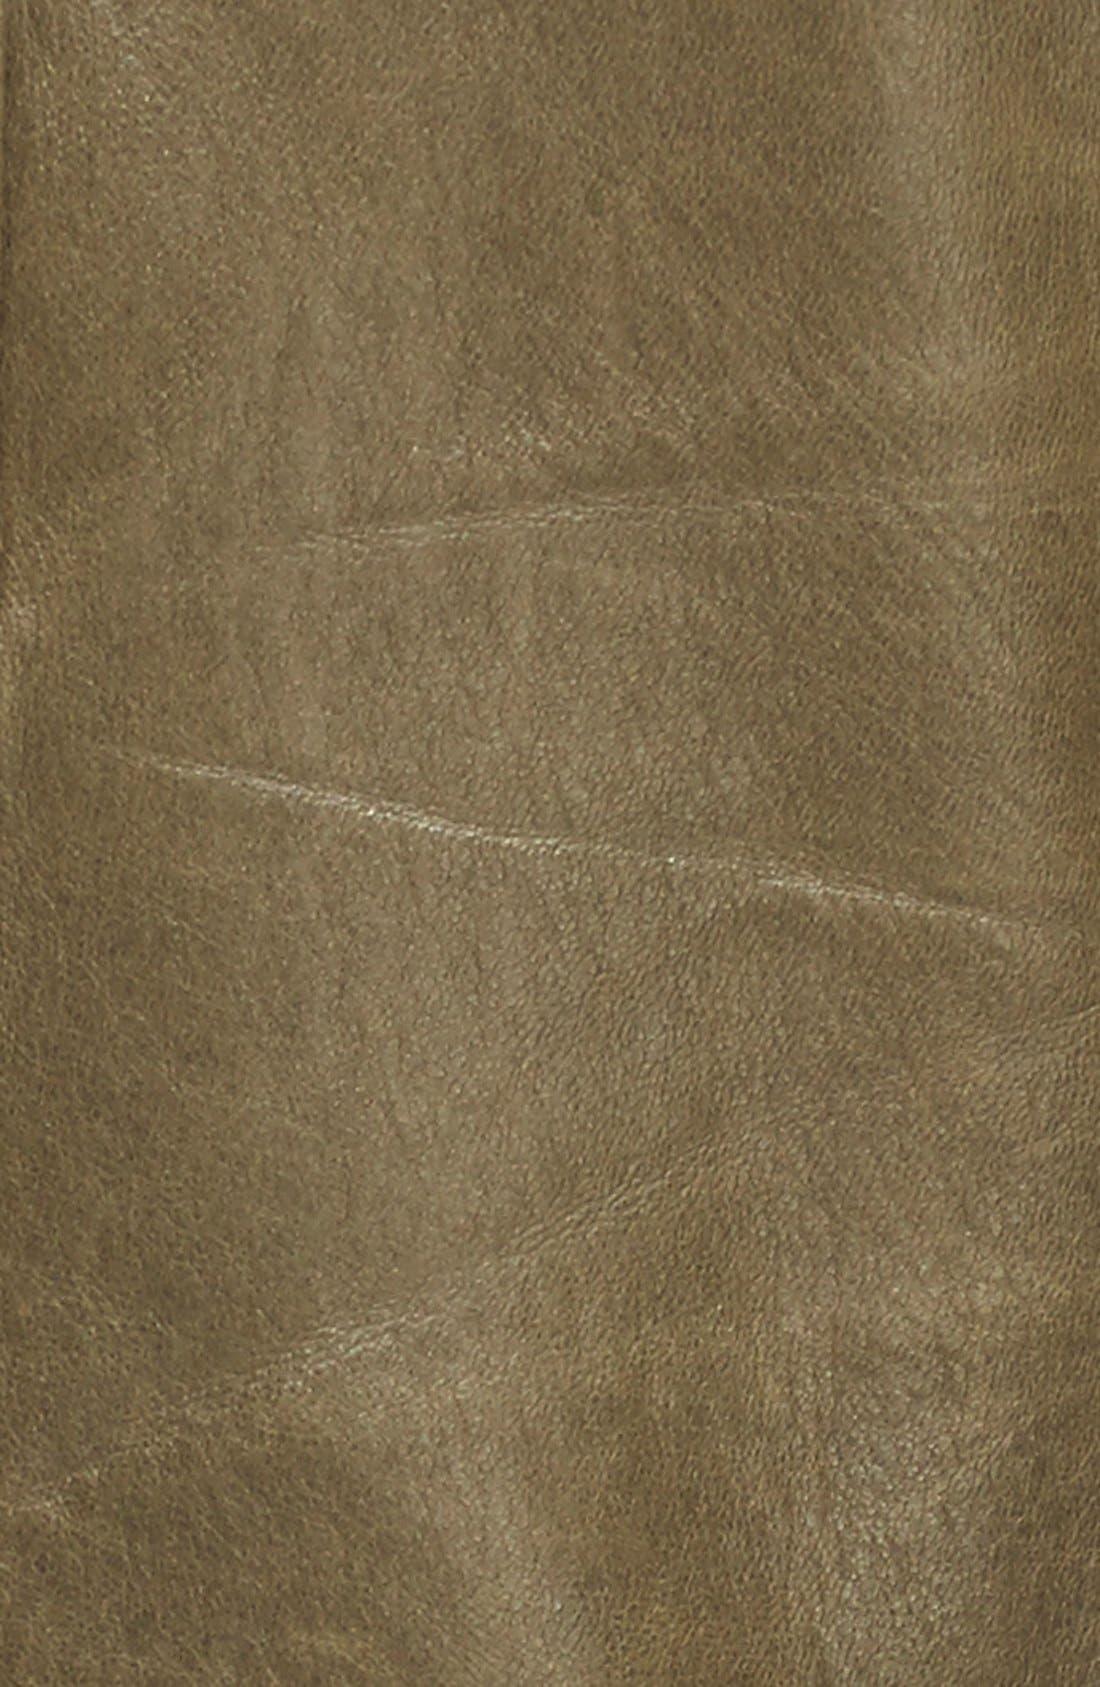 'Sidney' Leather Moto Jacket,                             Alternate thumbnail 6, color,                             338